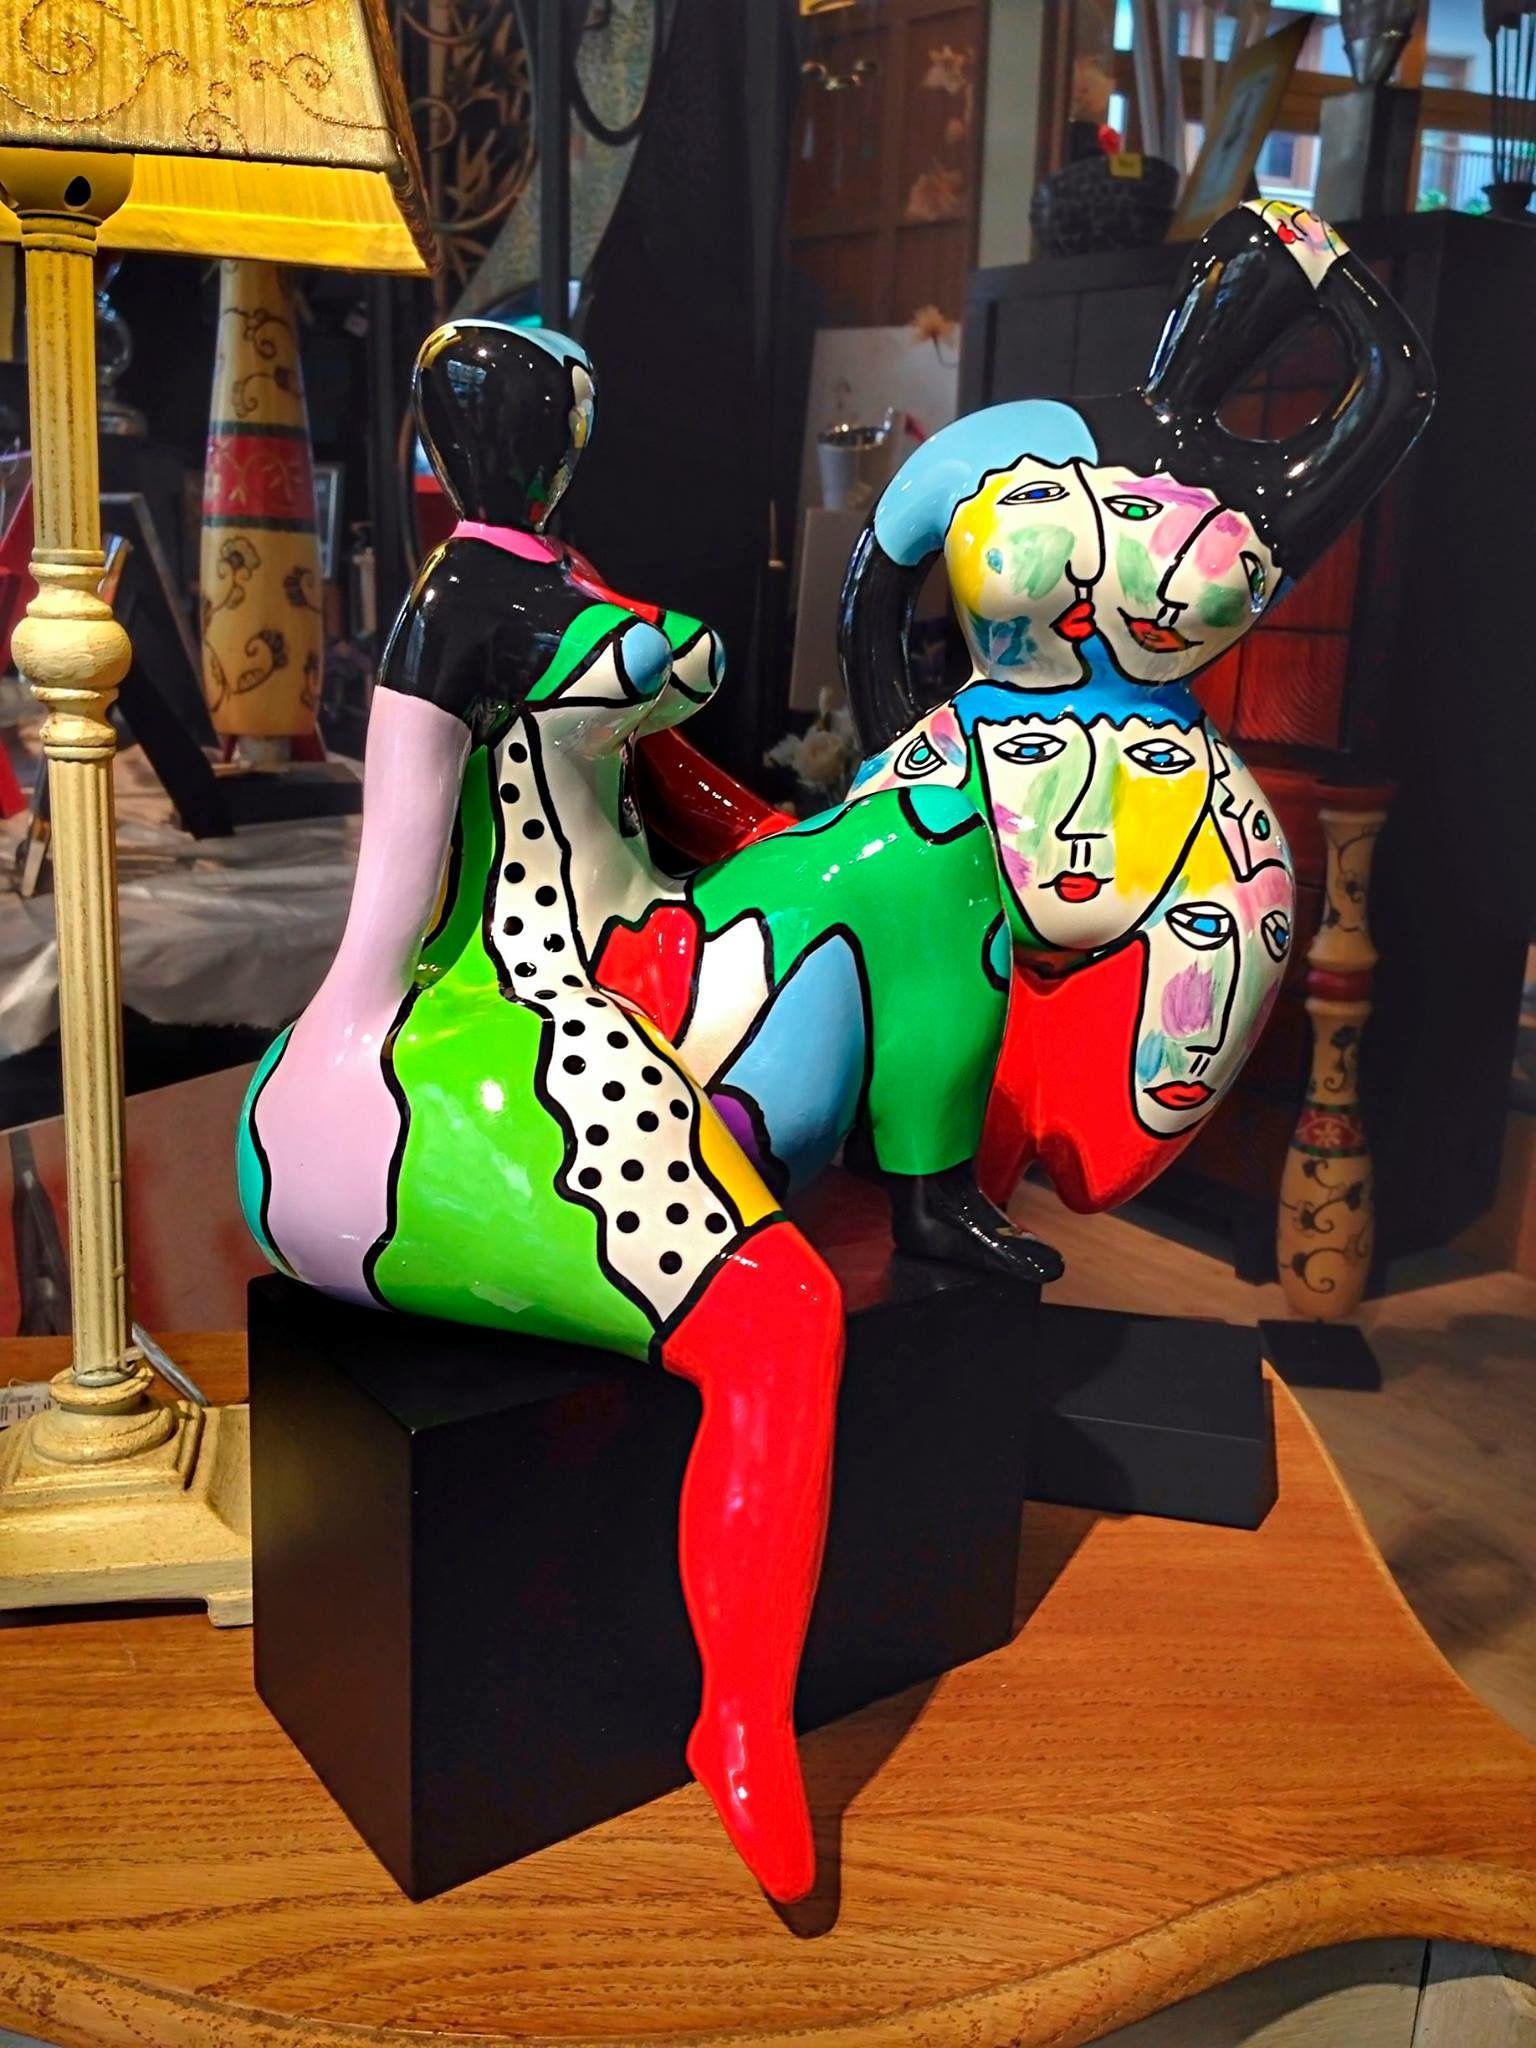 Esculturas modernas y coloridas esculturas escultura - Esculturas decoracion ...